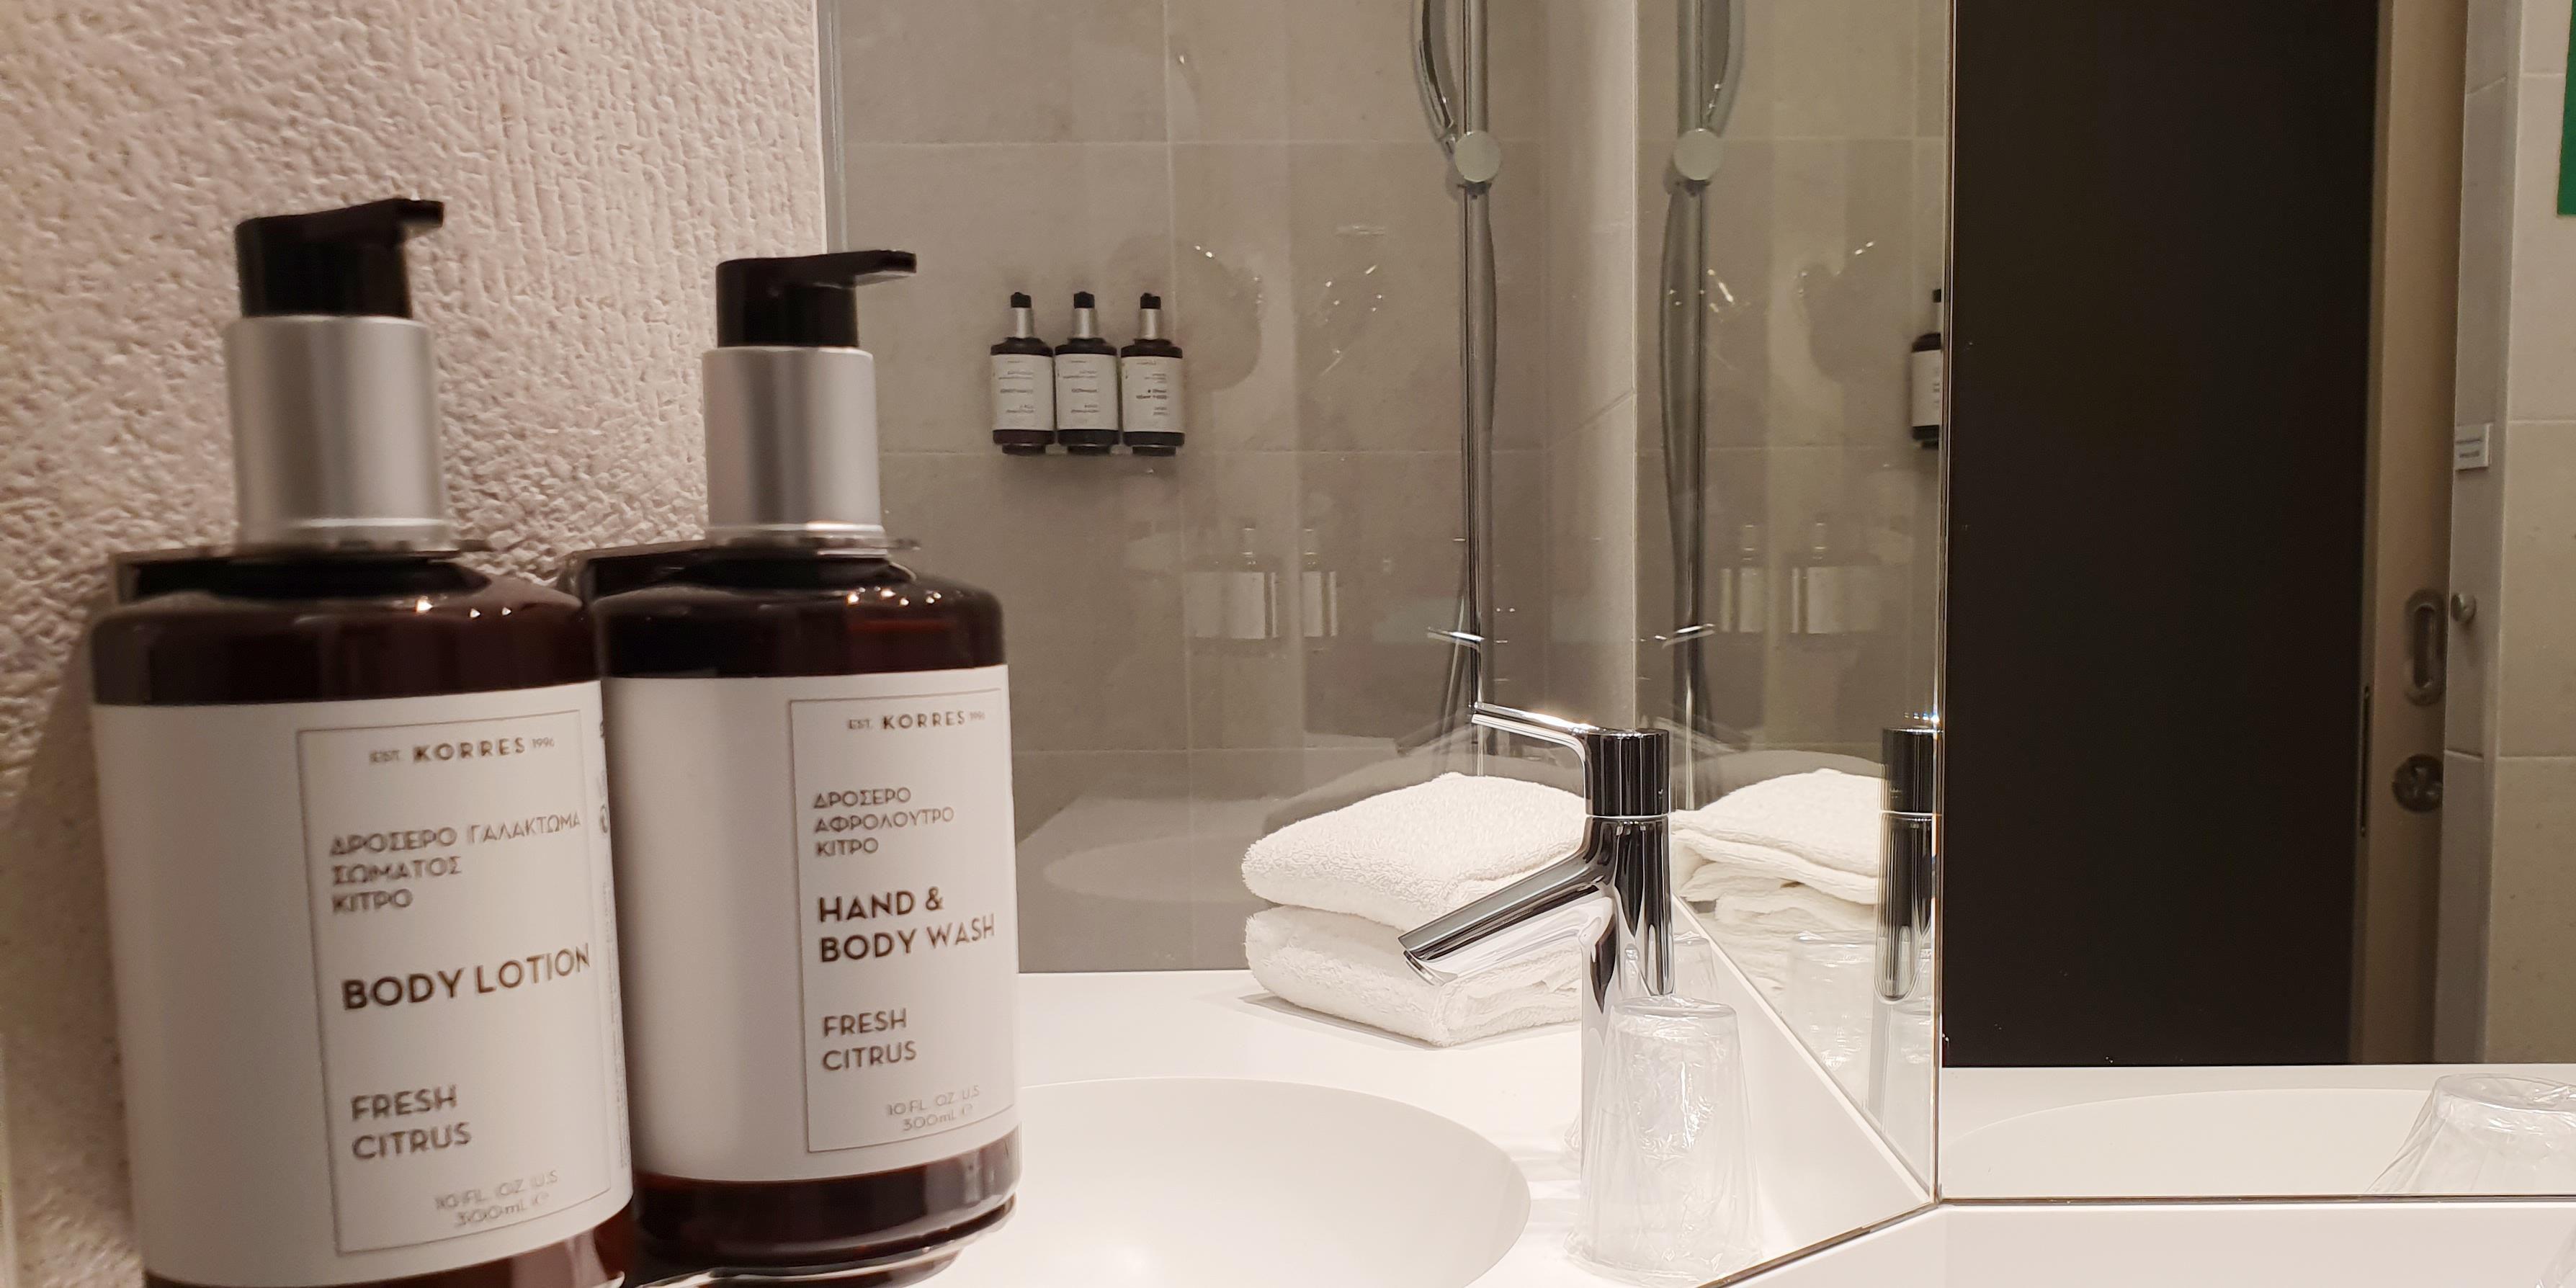 voco Strasbourg Centre The Garden - Bathroom amenities